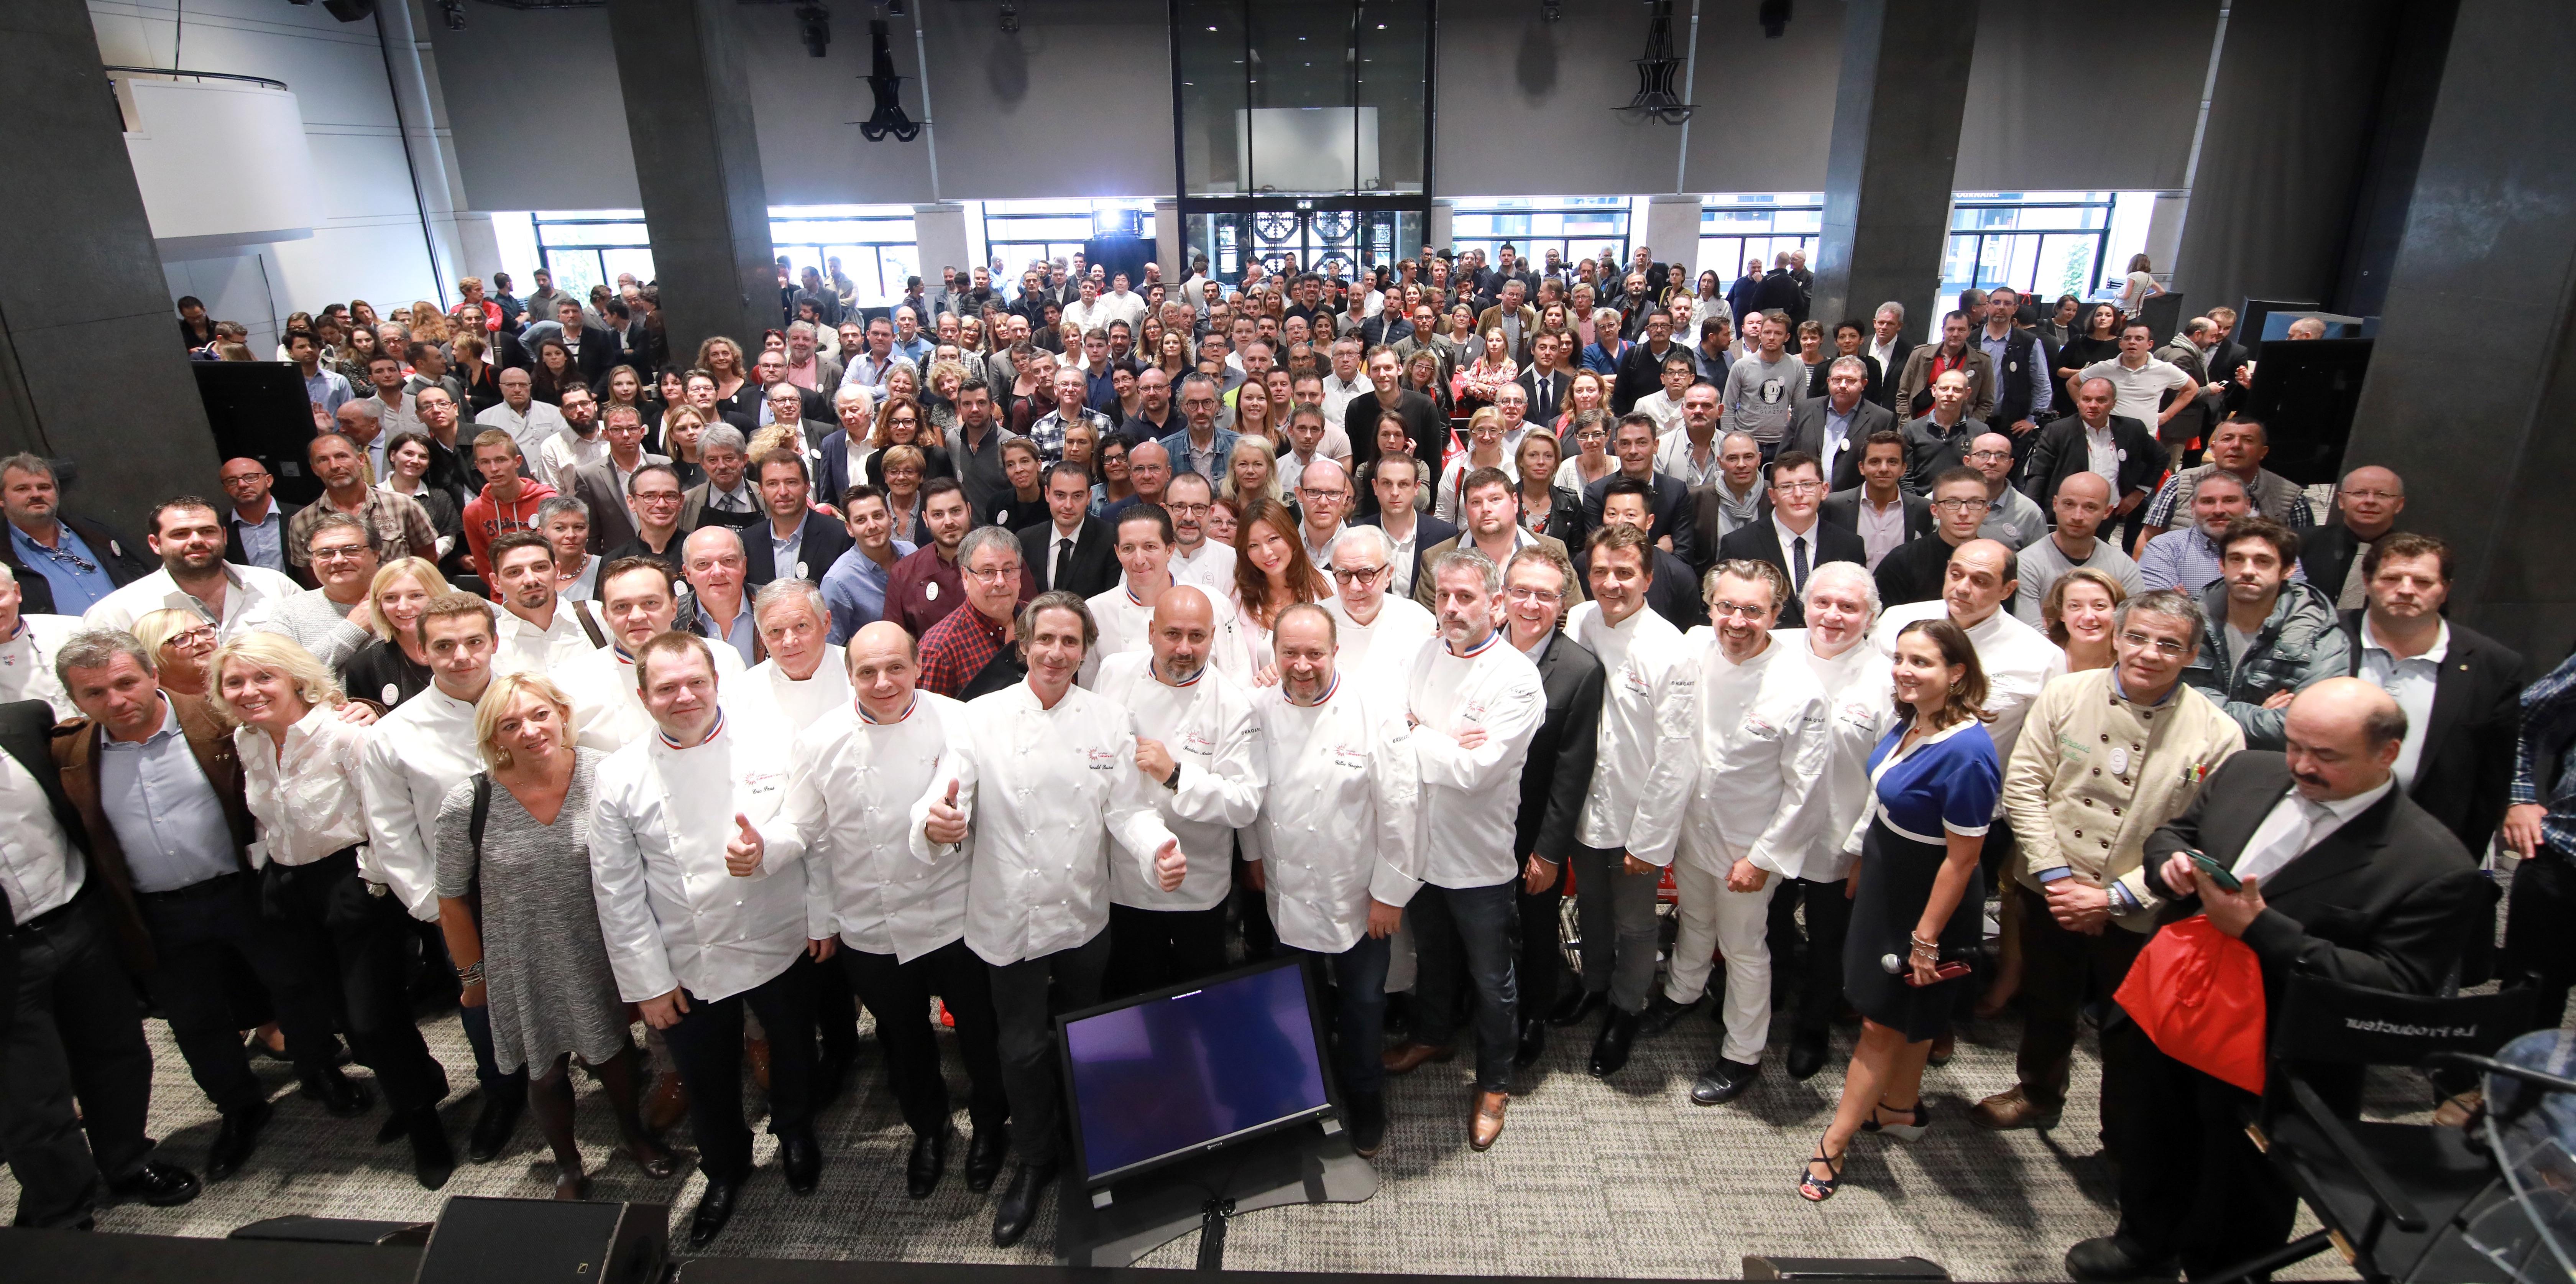 Collège Culinaire de France - Famille Moutard